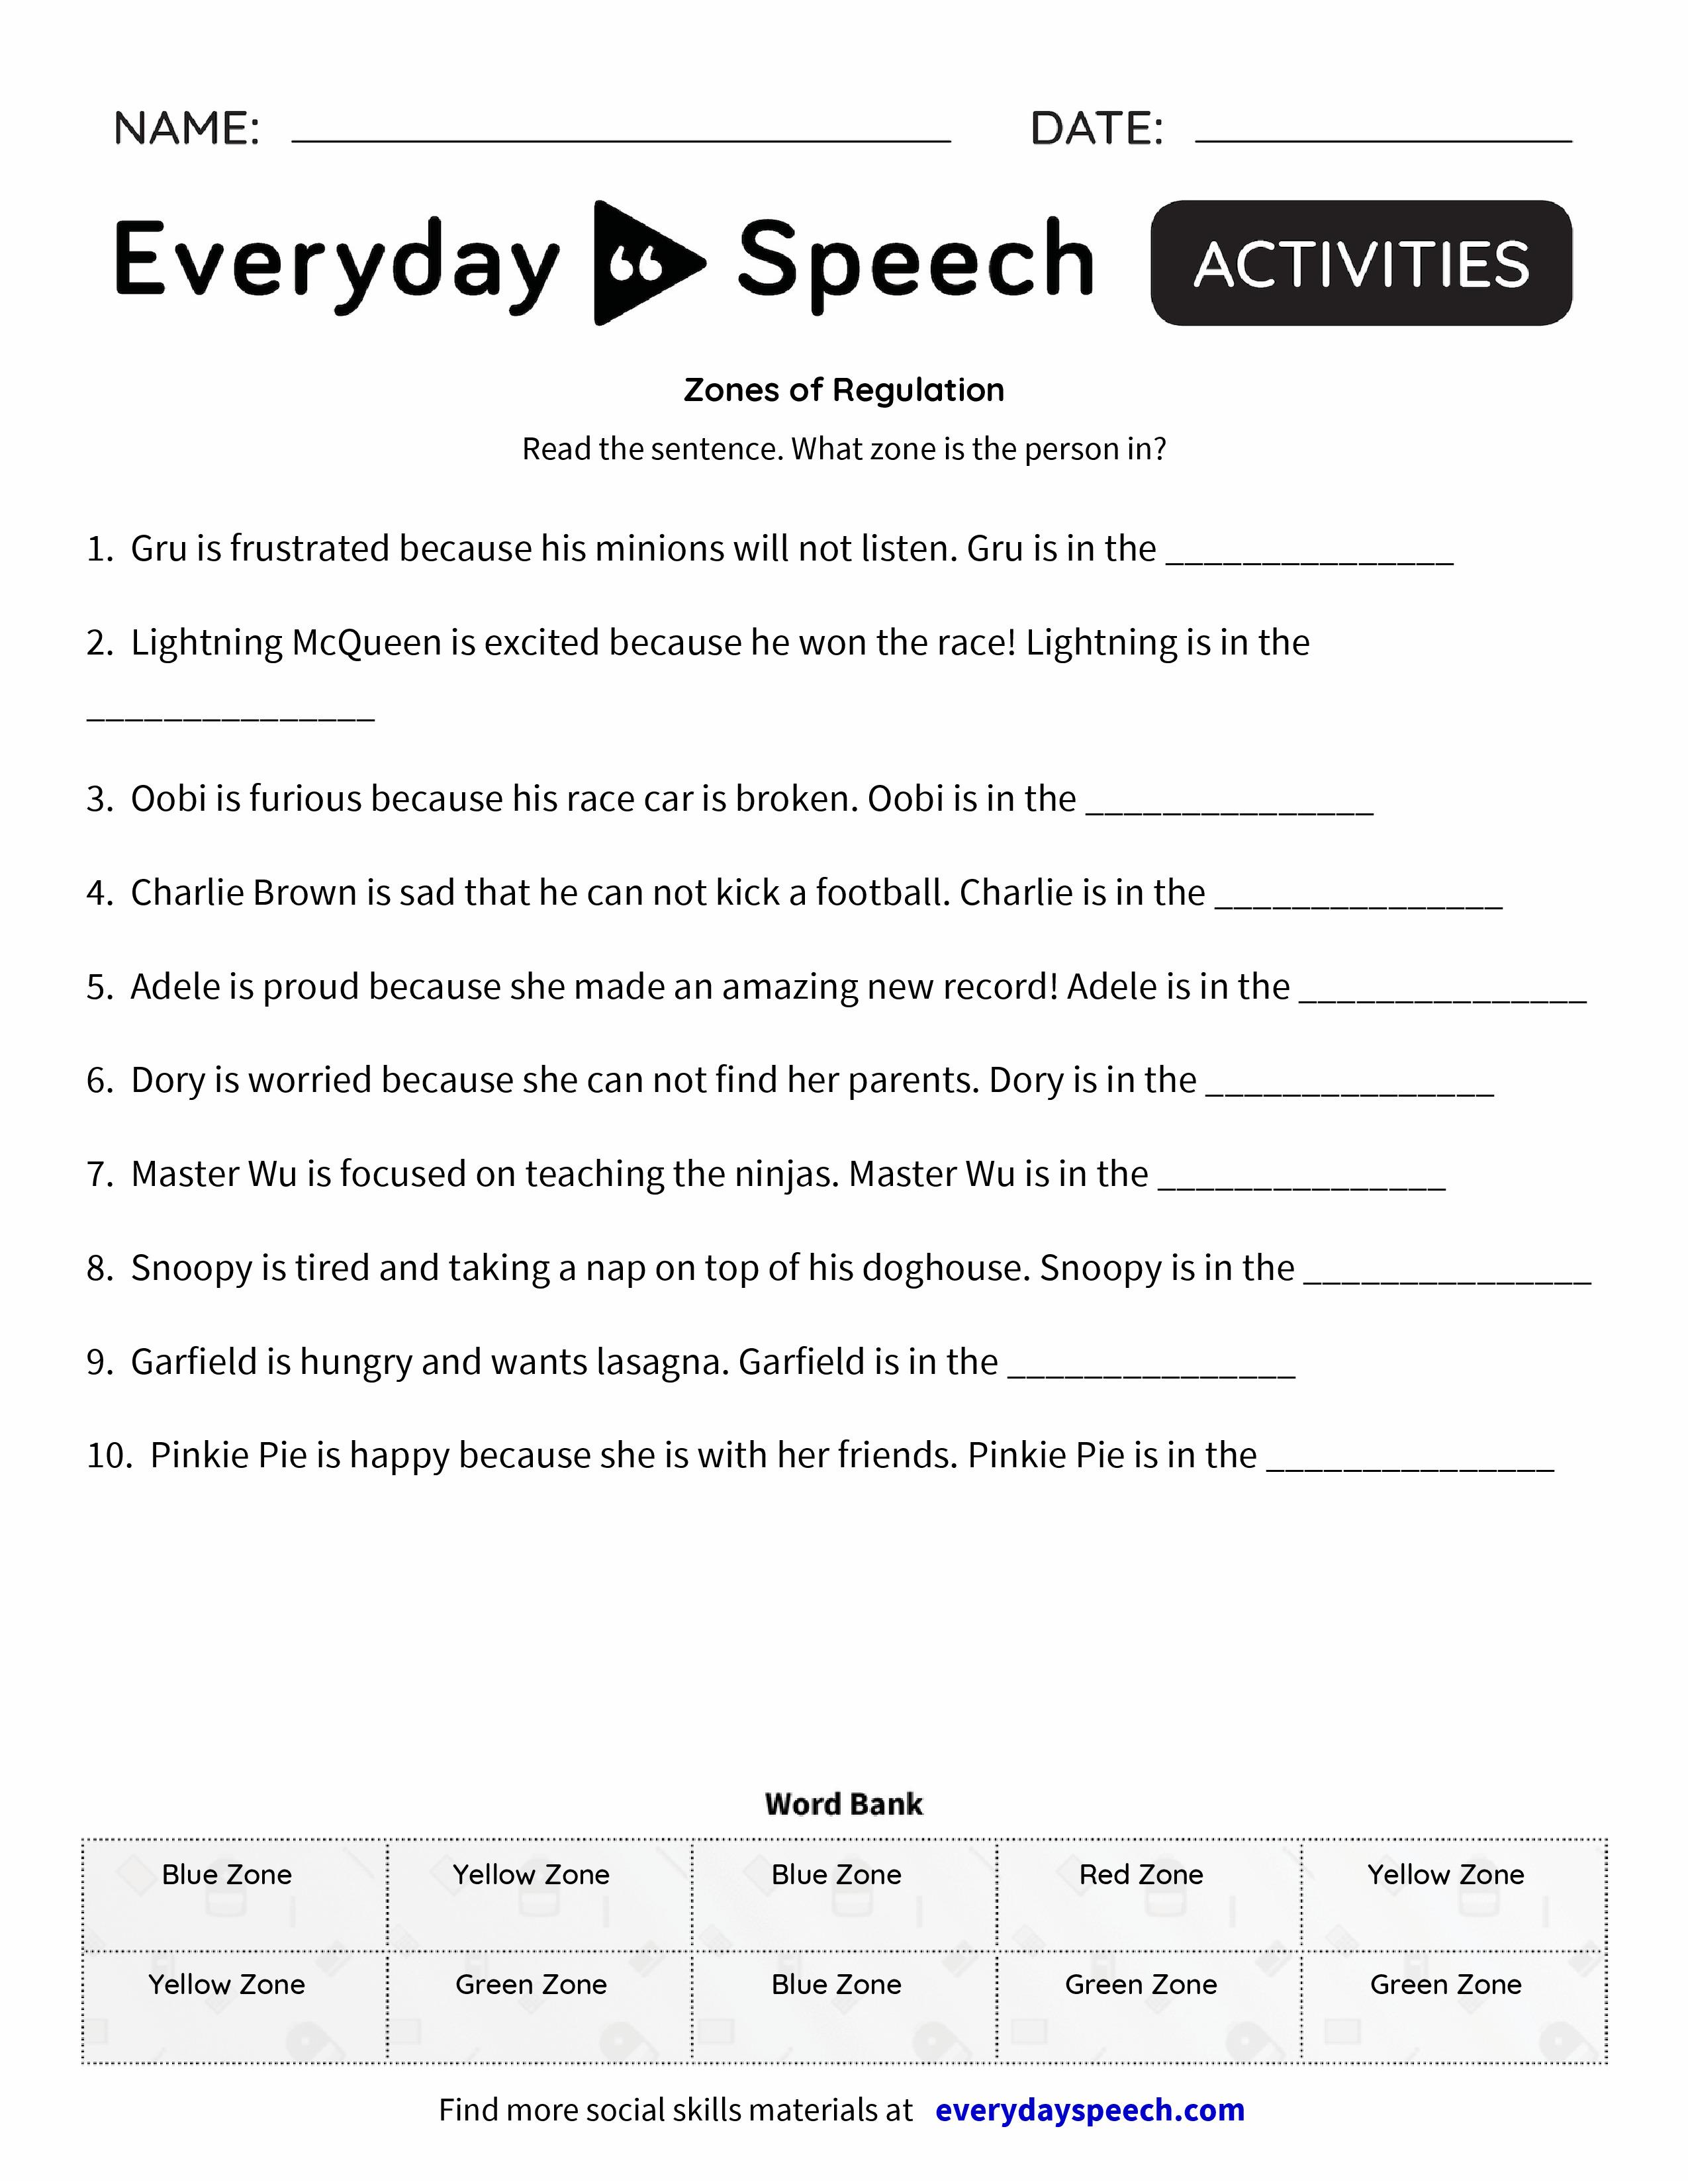 worksheet Emotion Regulation Worksheet Pdf zones of regulation everyday speech preview